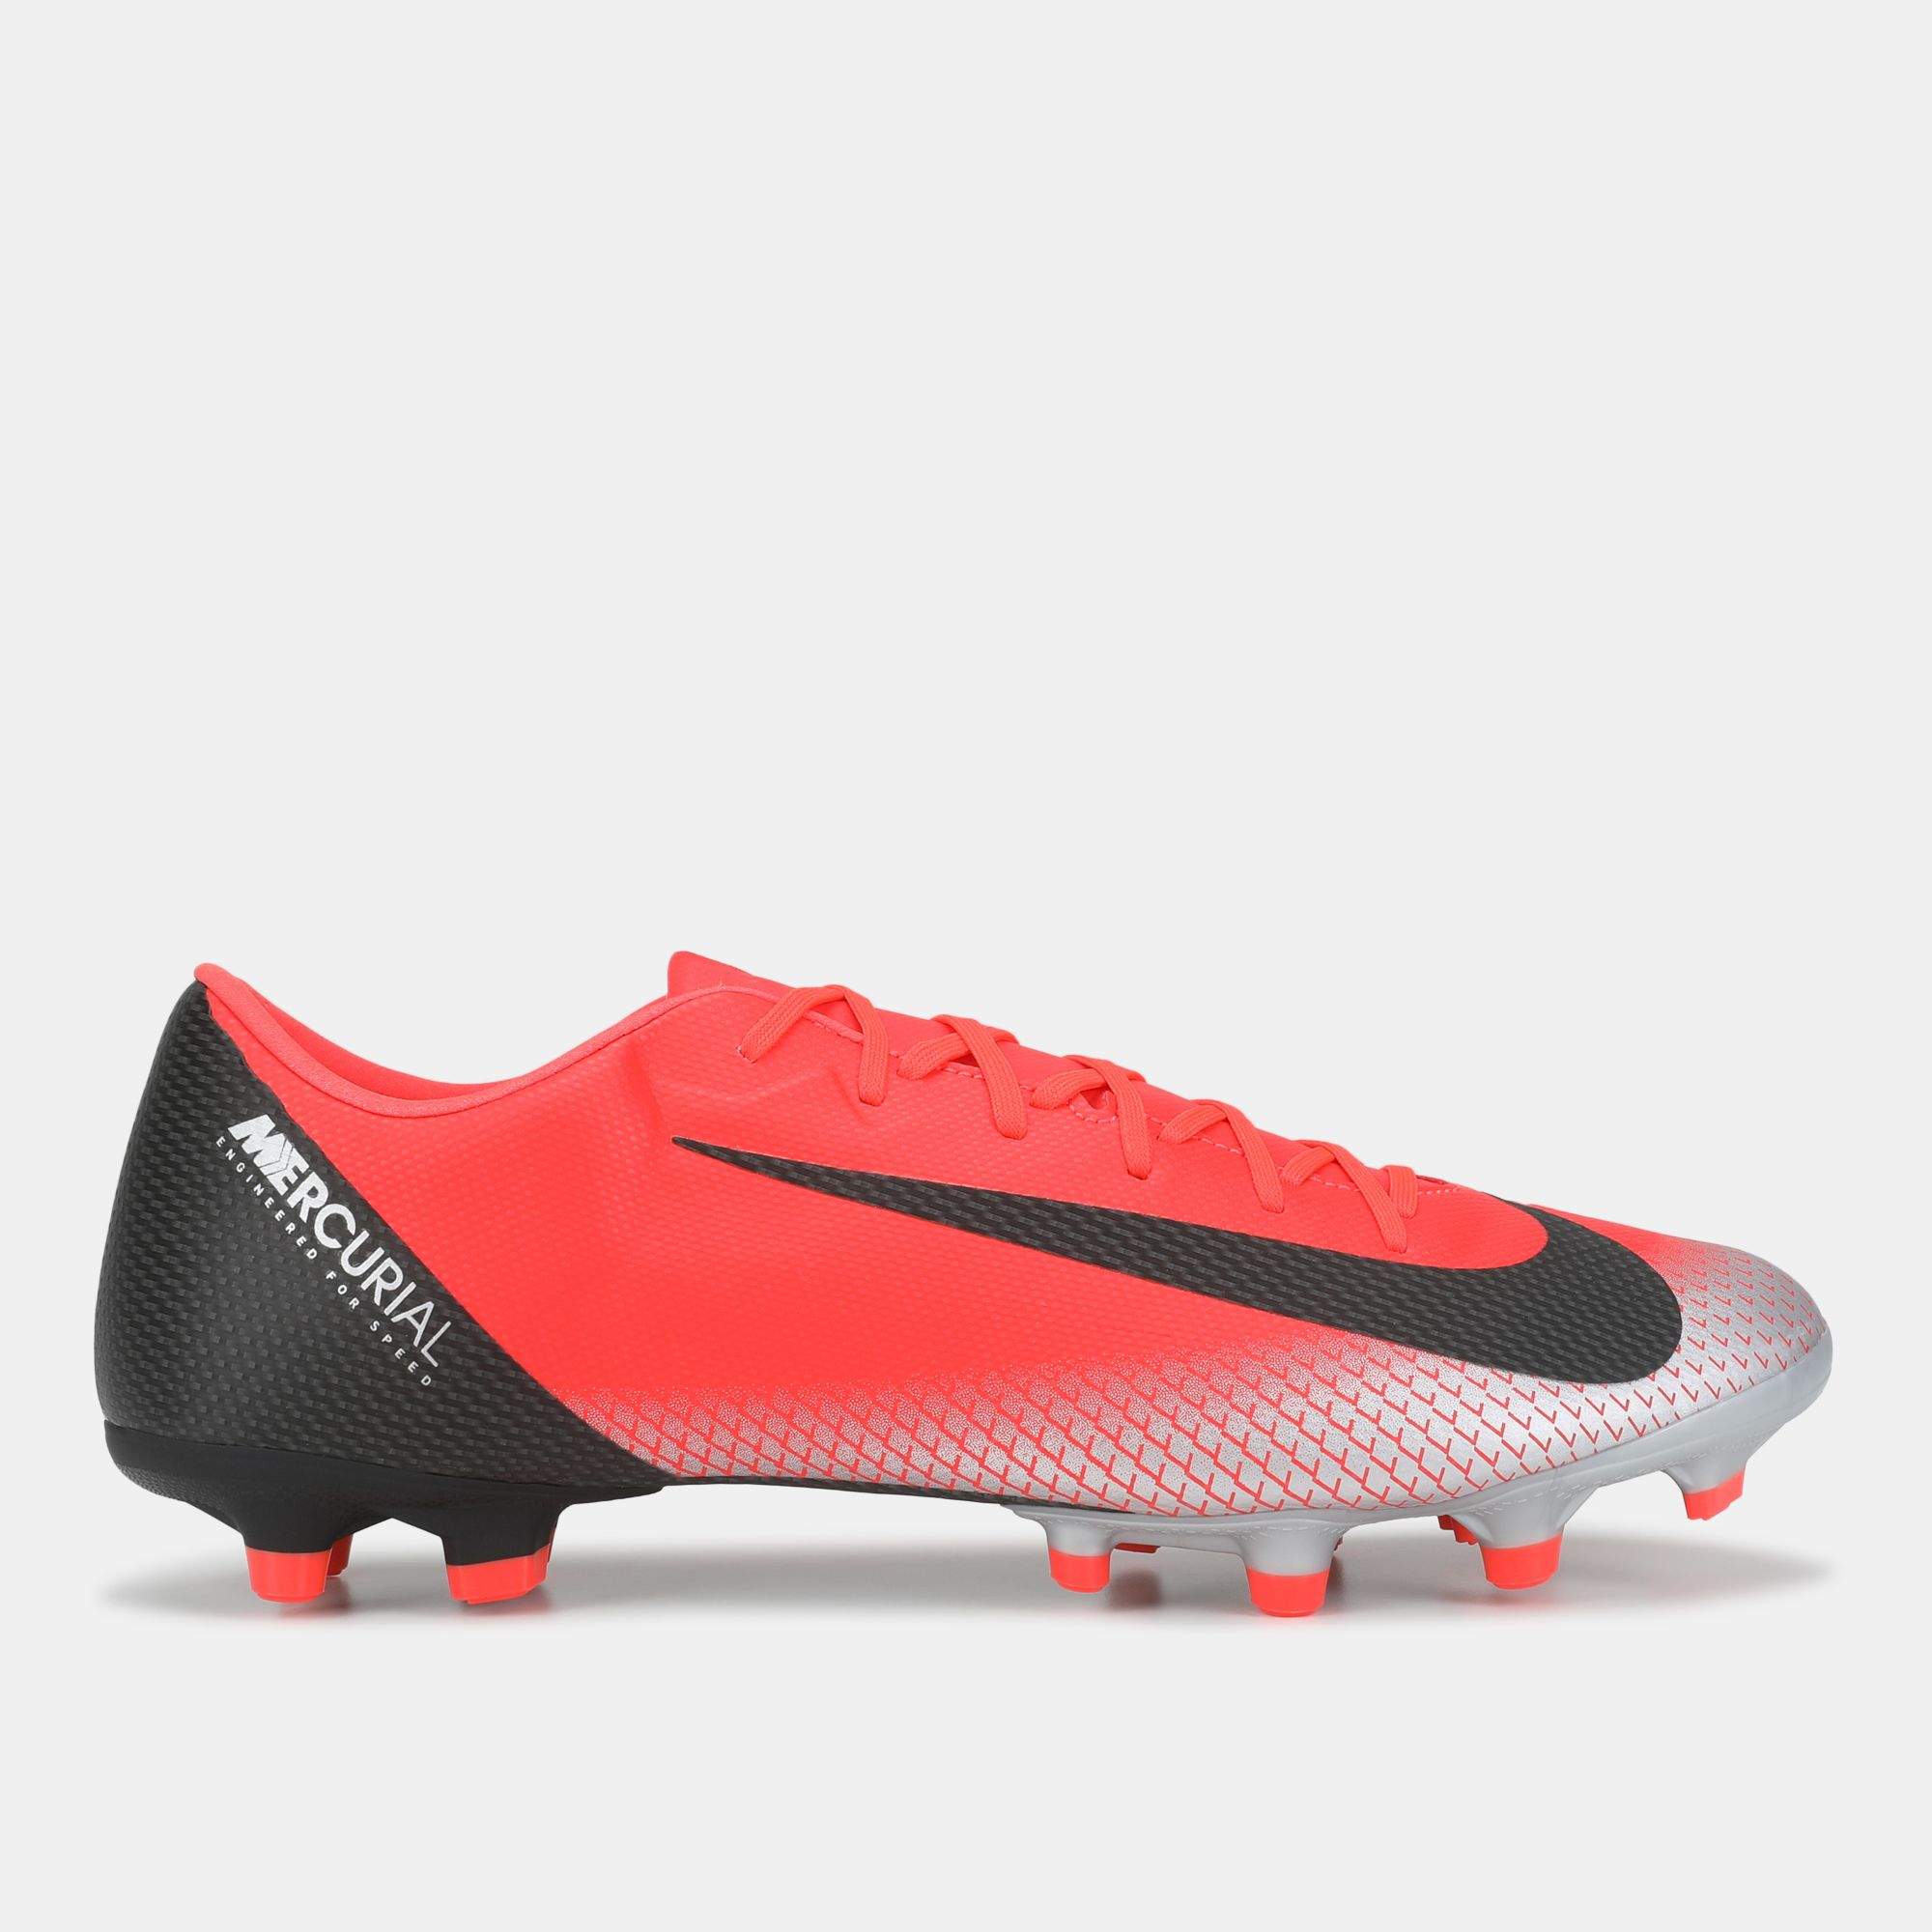 dc5cbd26f Nike Mercurial Vapor 12 Academy CR7 Multi-Ground Football Shoe ...